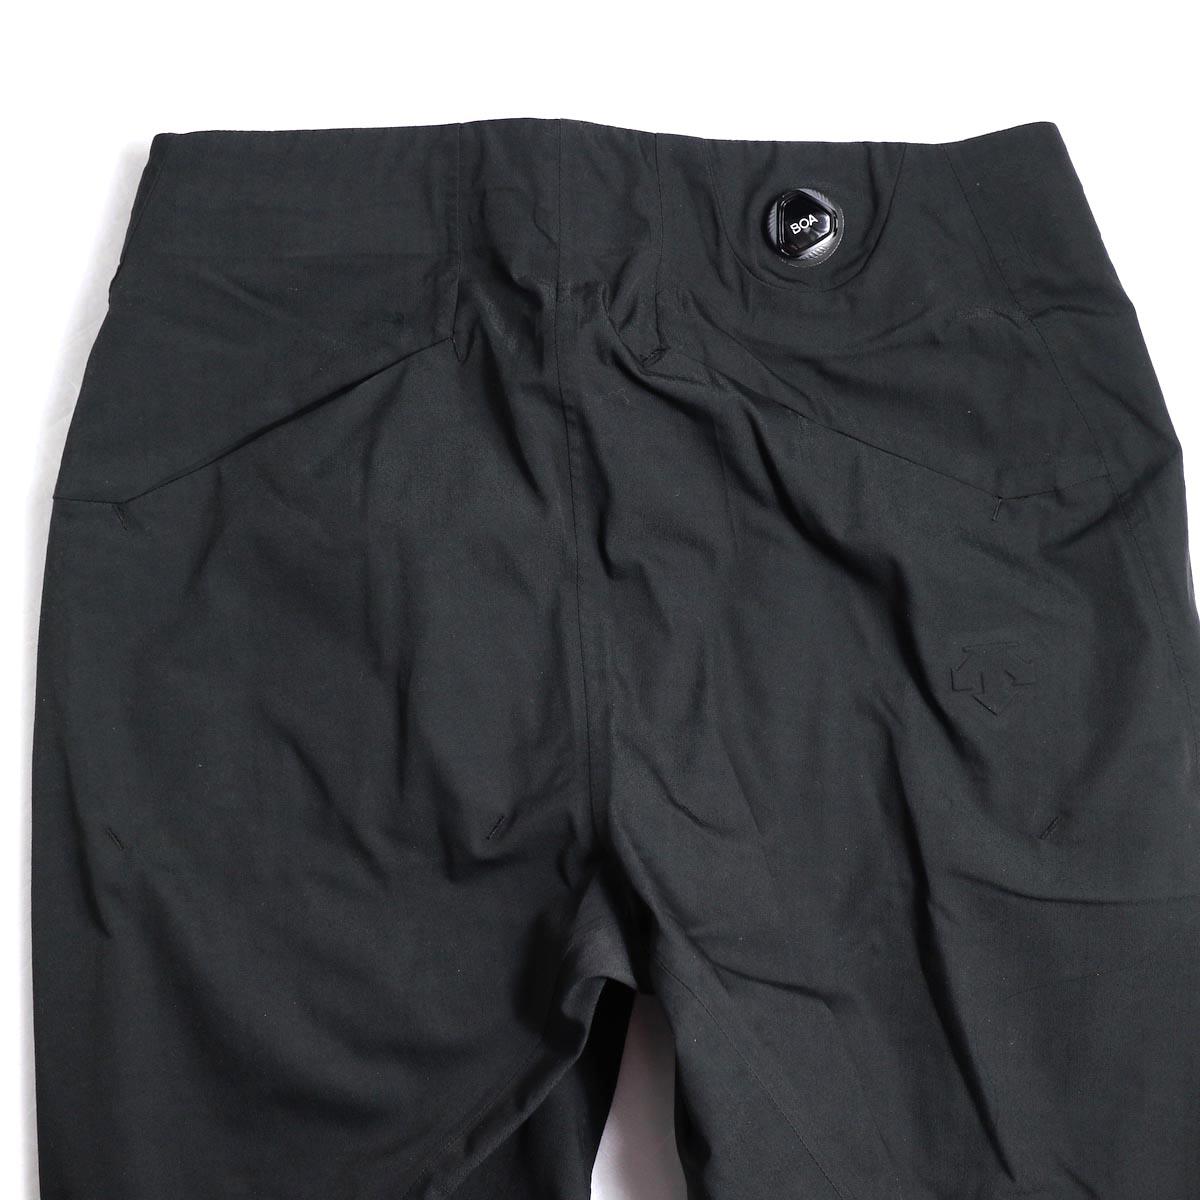 DESCENTE ALLTERAIN / Boa Long Pants Tapered Fit -Black 背面ウエスト